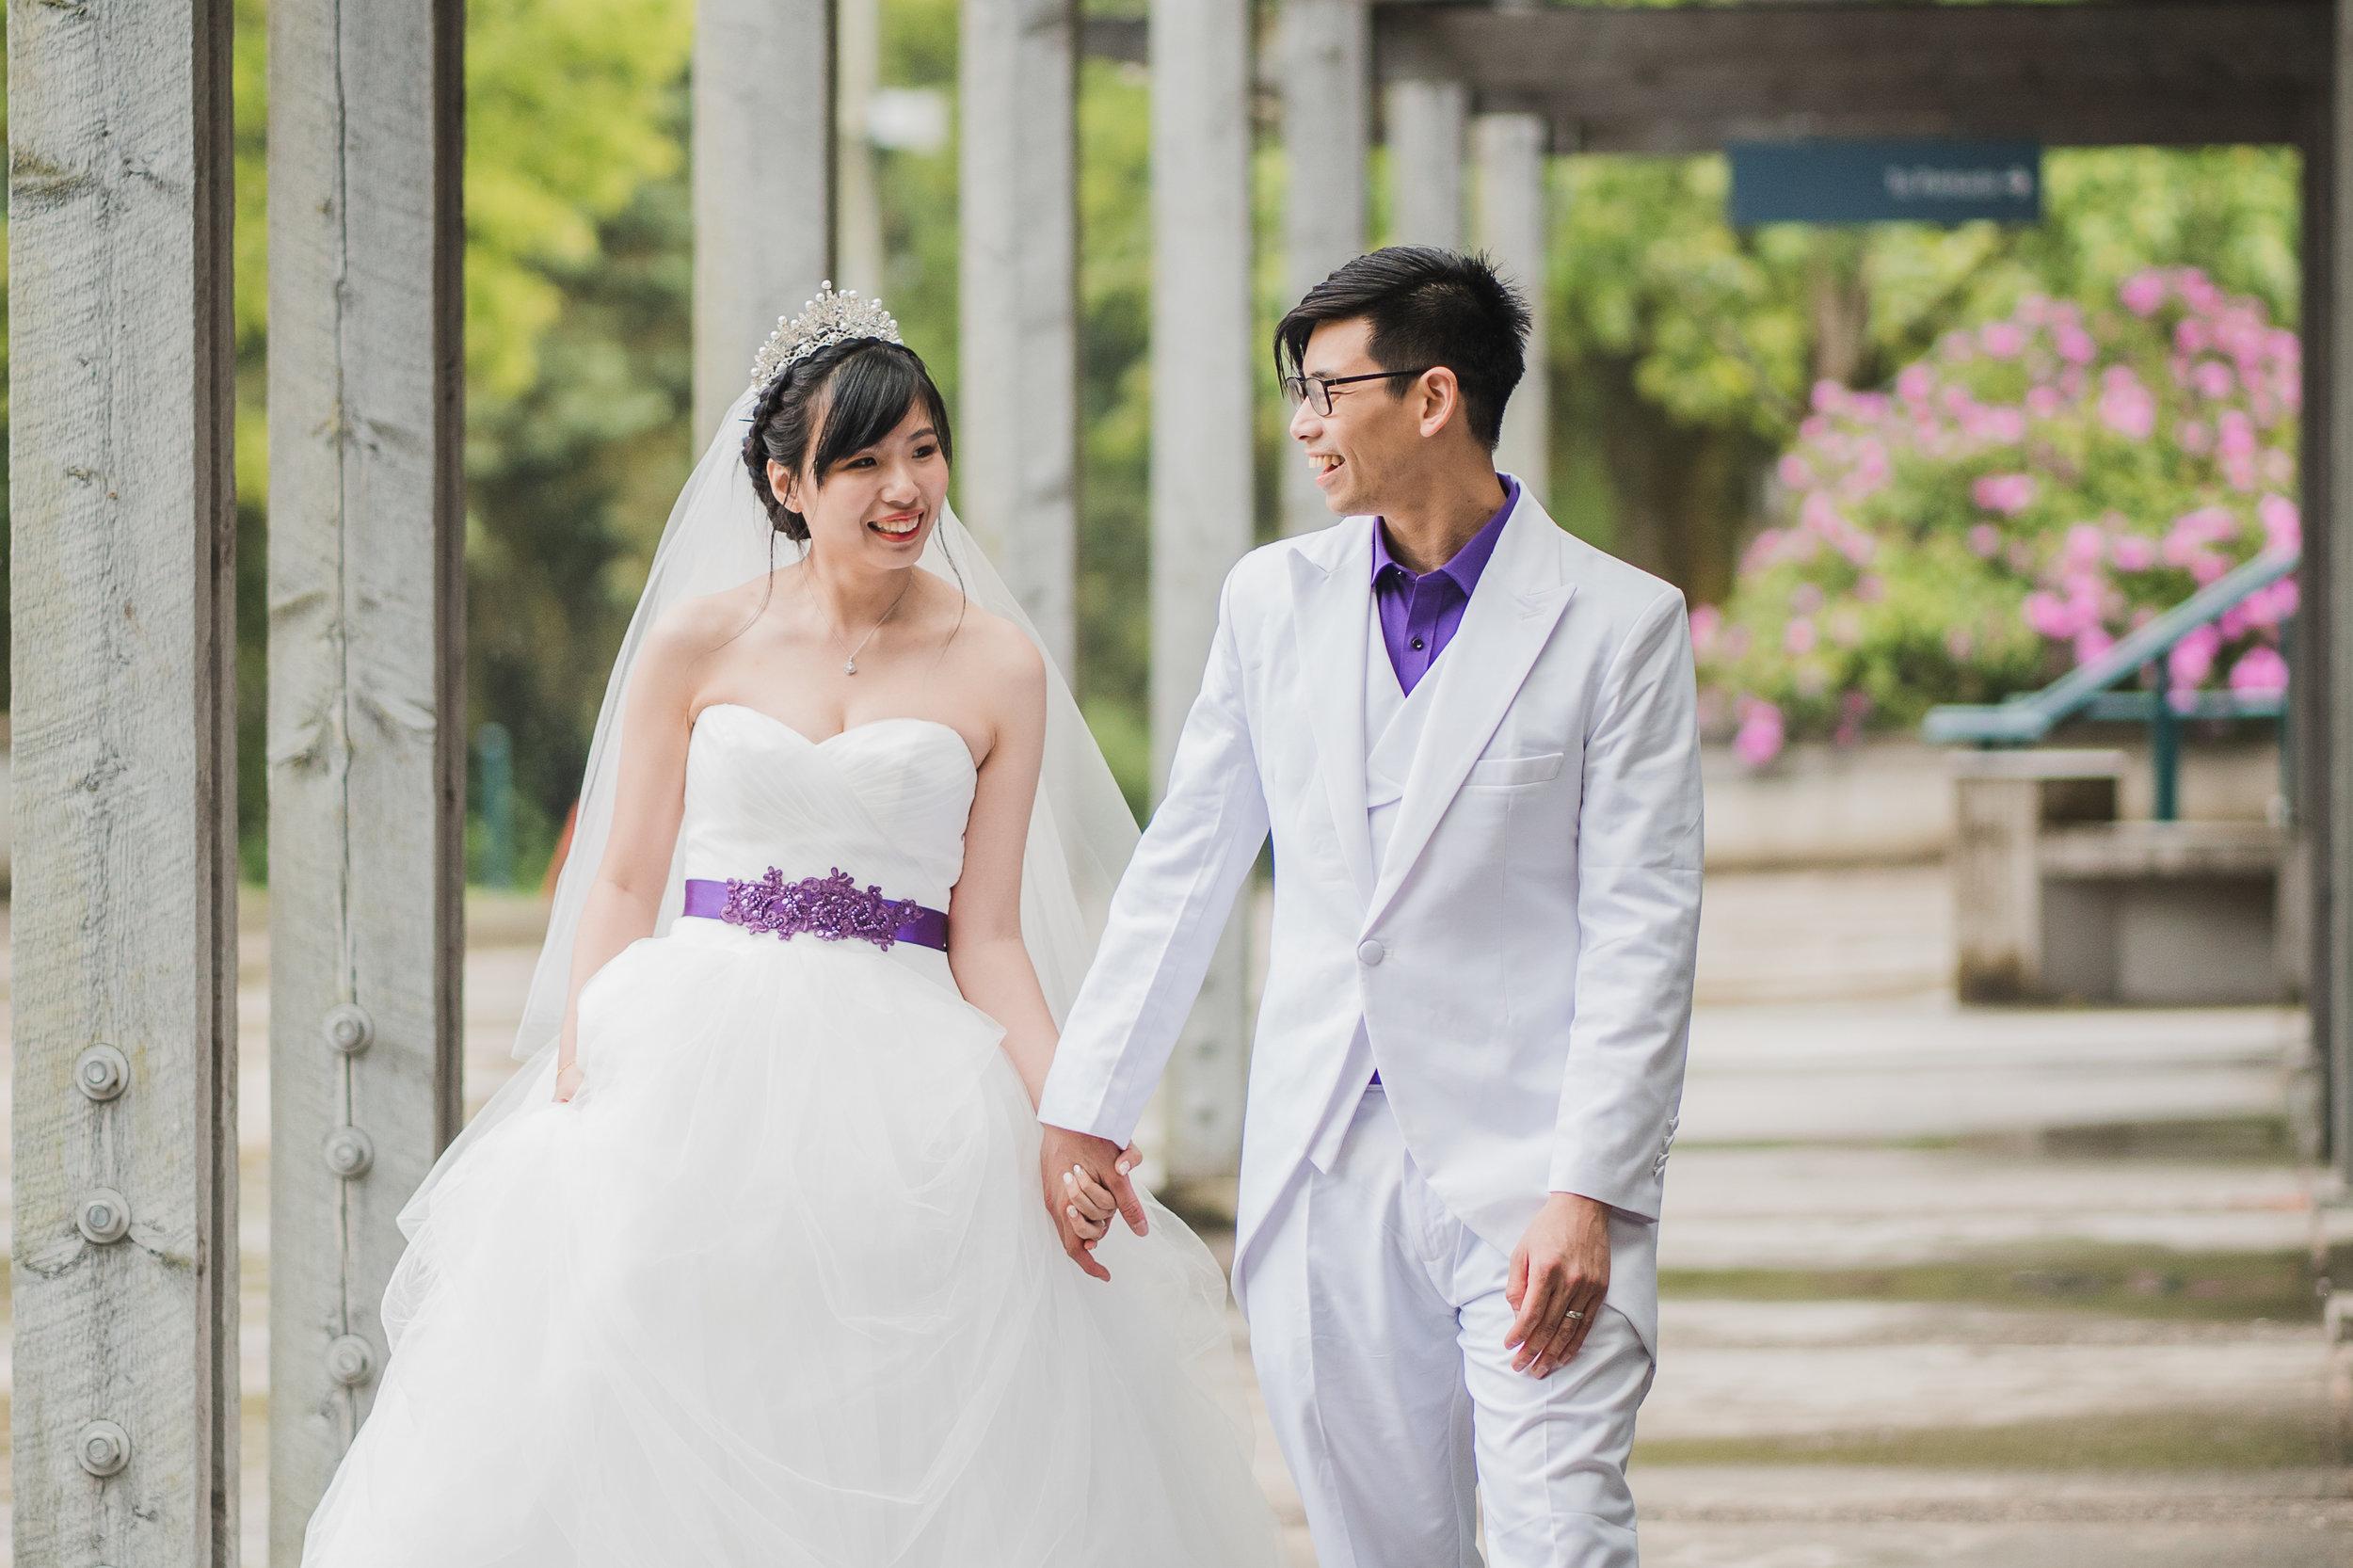 20190520 - Pamela & Matthew Wedding - 0242.jpg